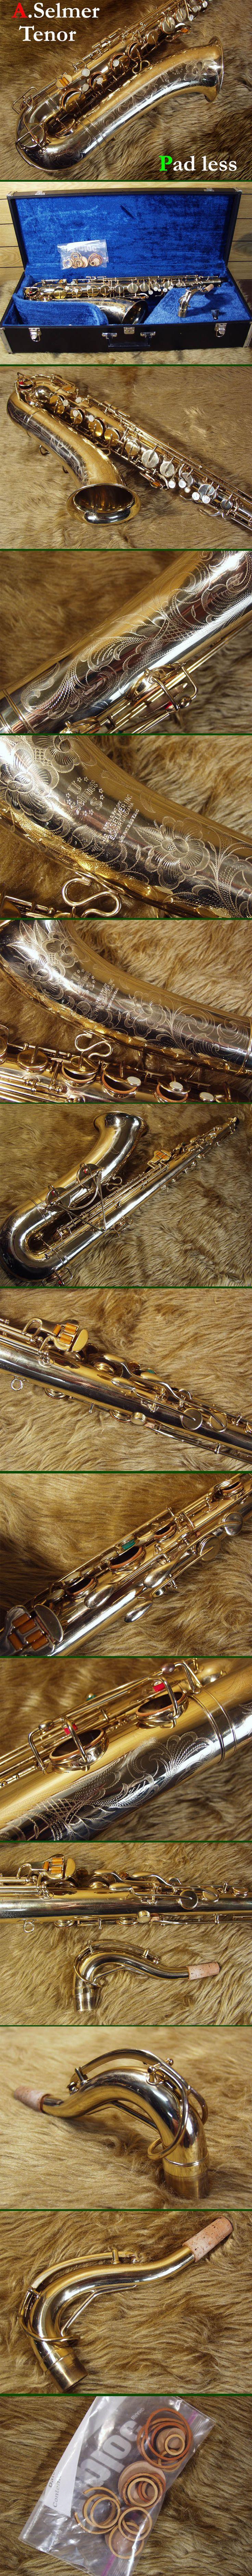 98 best saxophone images on pinterest musical instruments